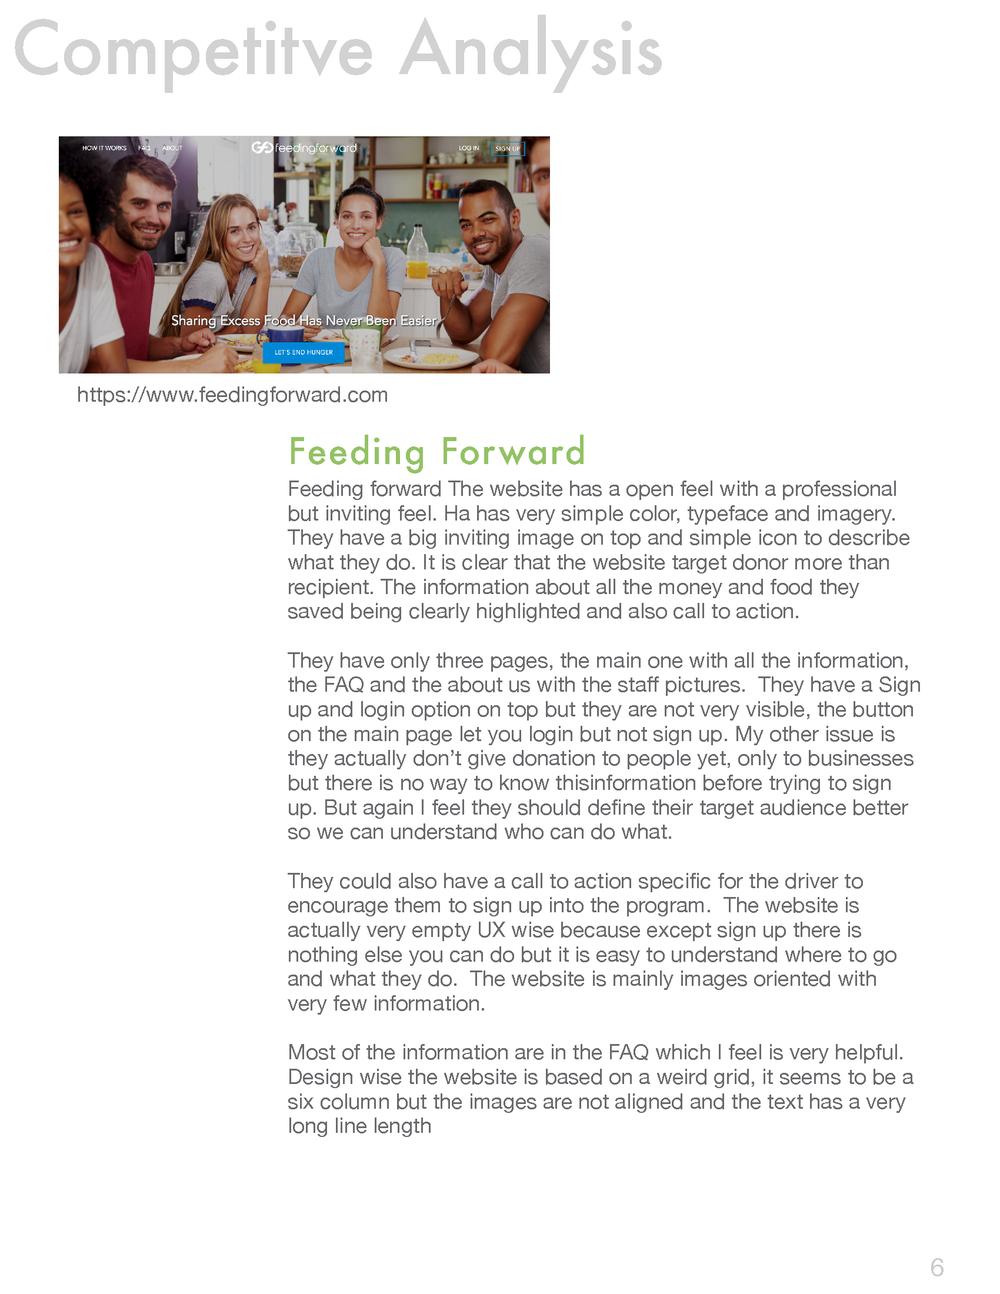 UX food bank app_Page_06.png